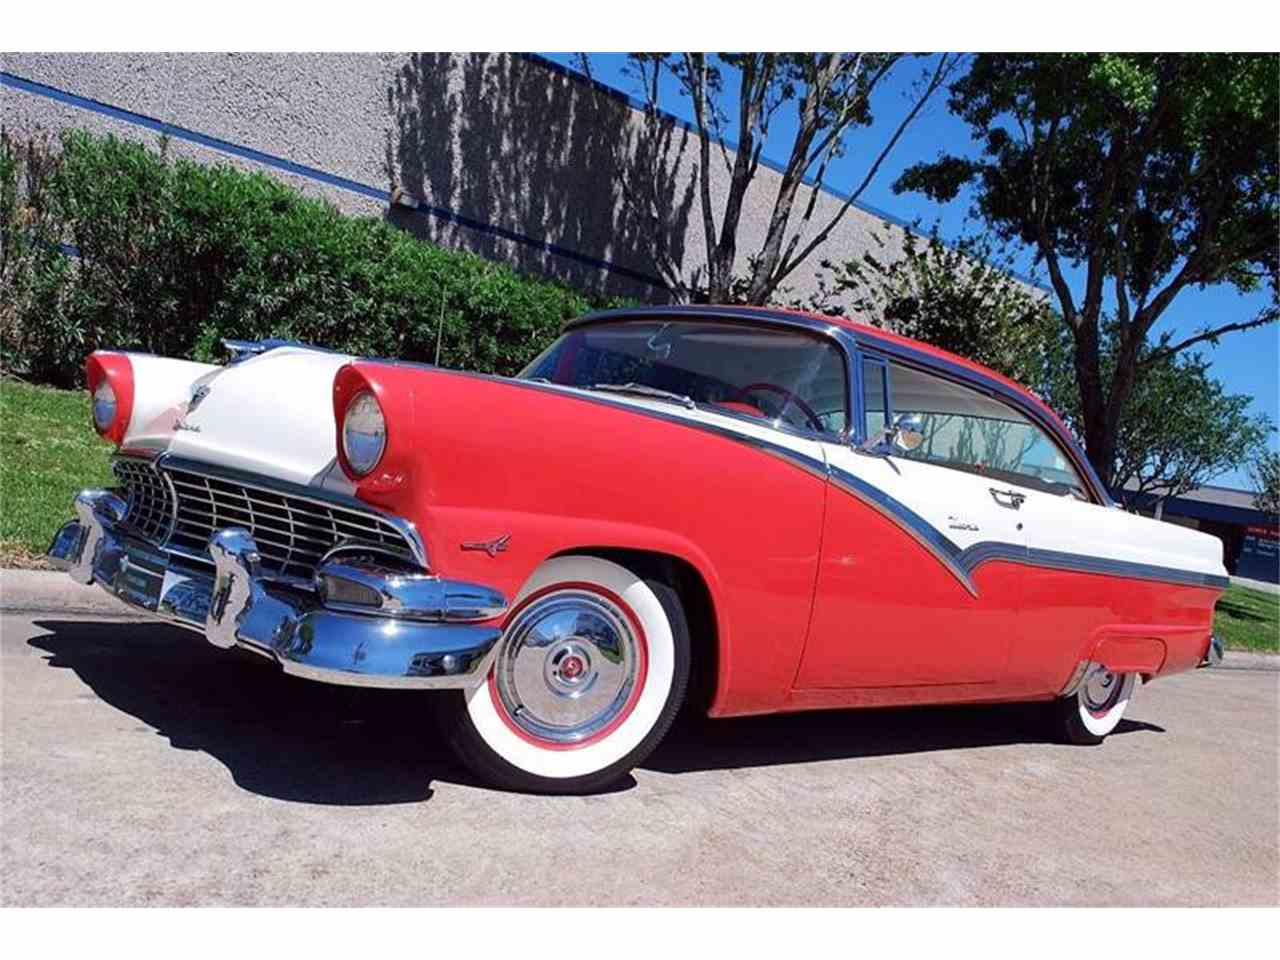 Classic Cars For Sale Houston Area: 1956 Ford Fairlane Victoria For Sale